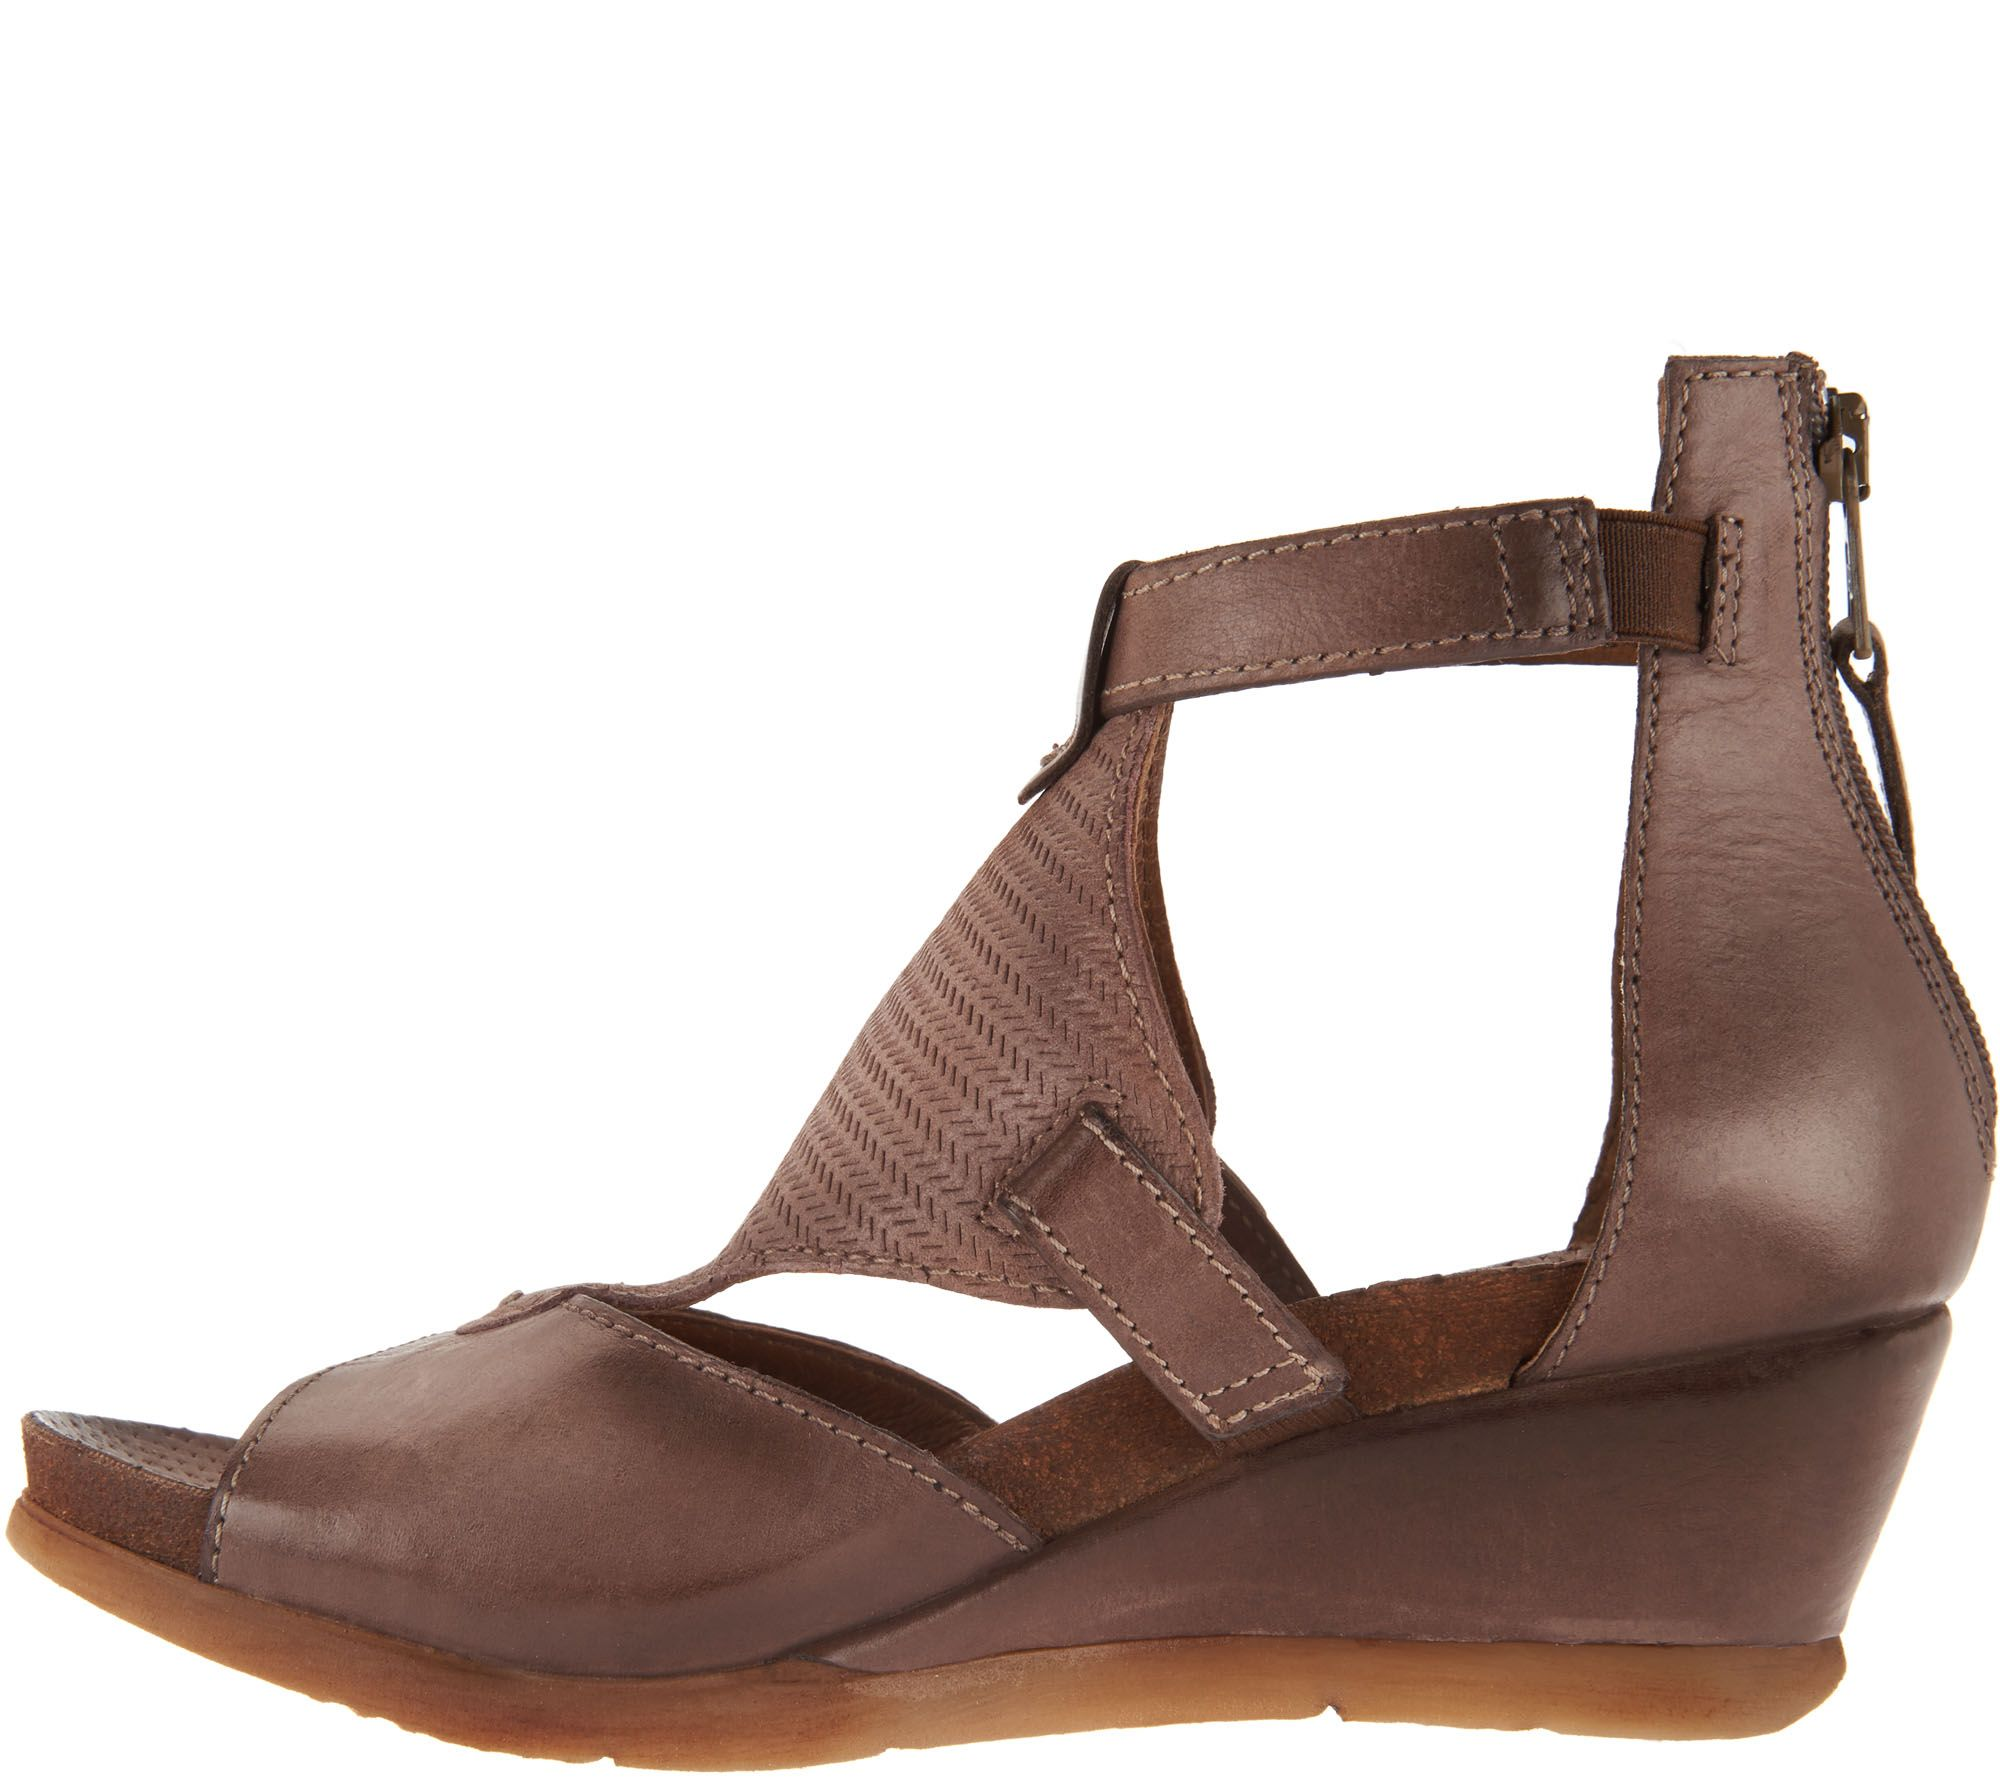 5fa6f11906b Miz Mooz Leather Wedge Sandals - Maisie - Page 1 — QVC.com